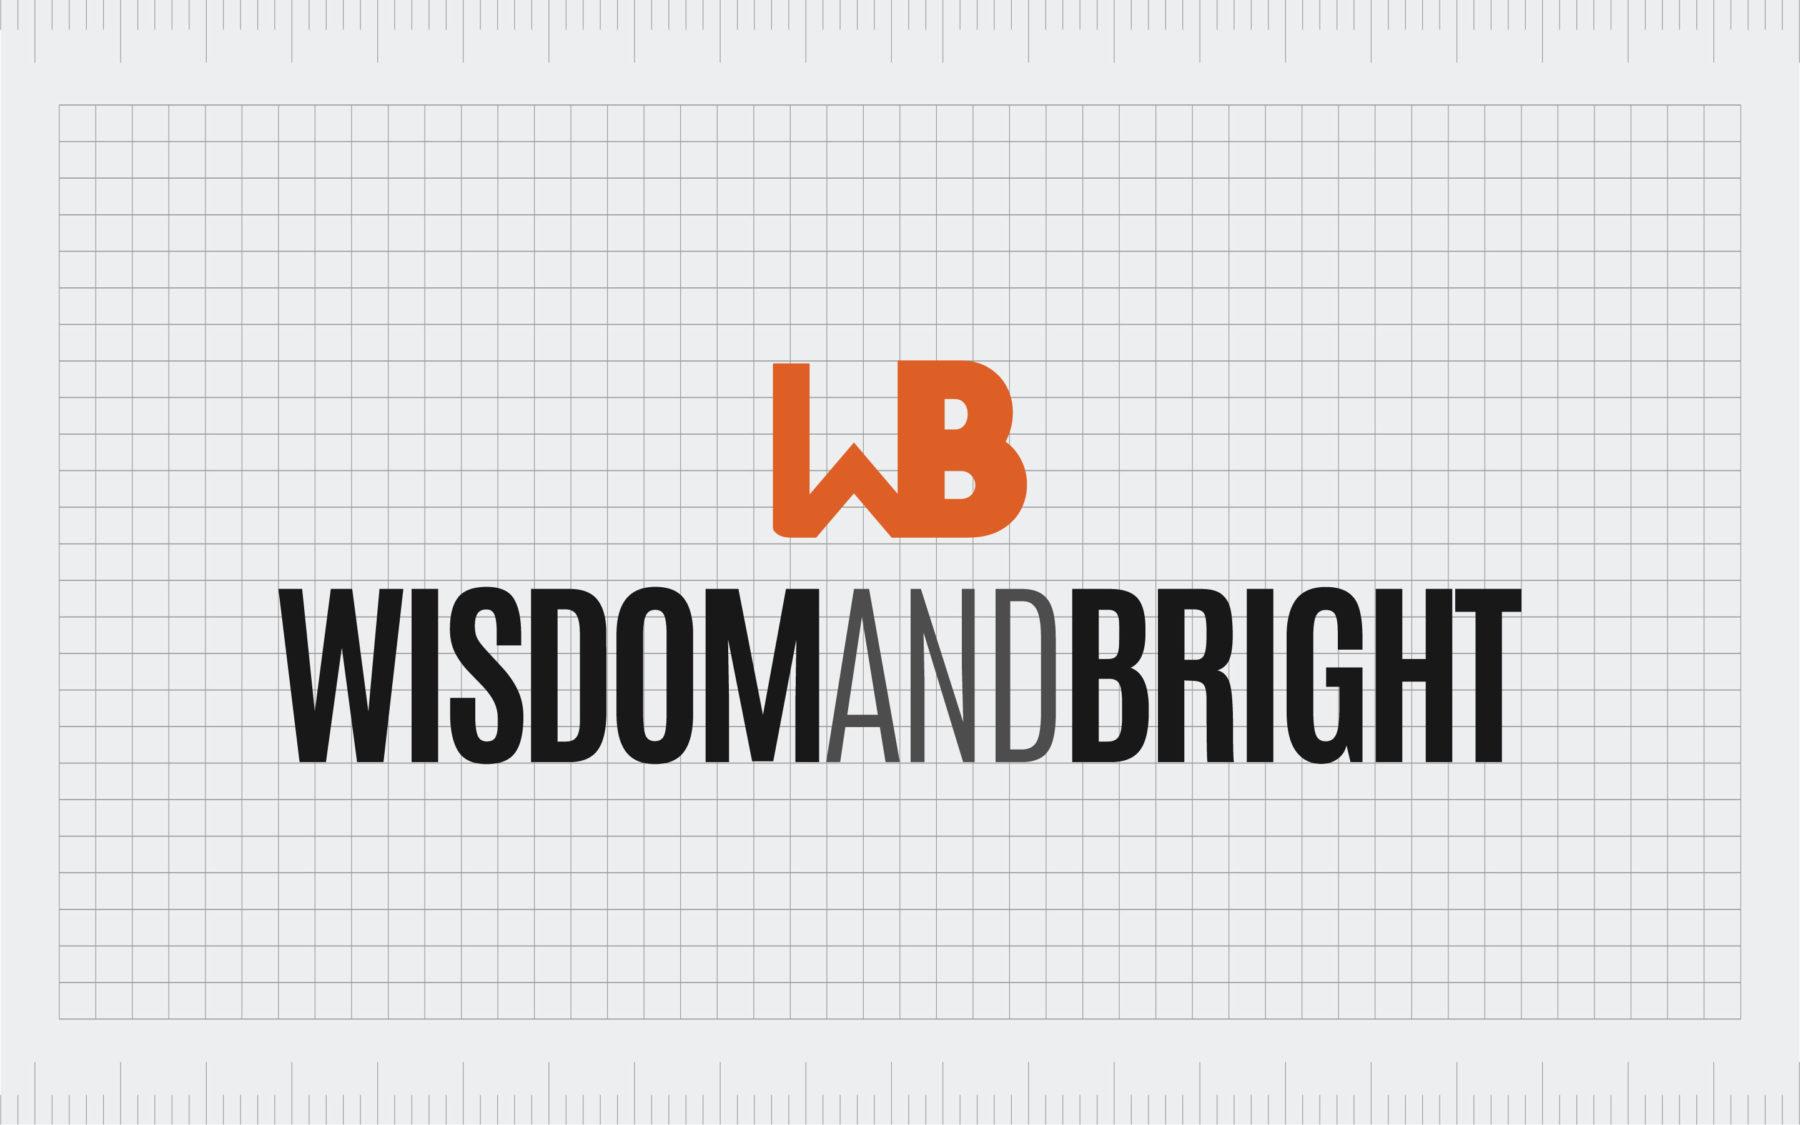 WisdomandBright